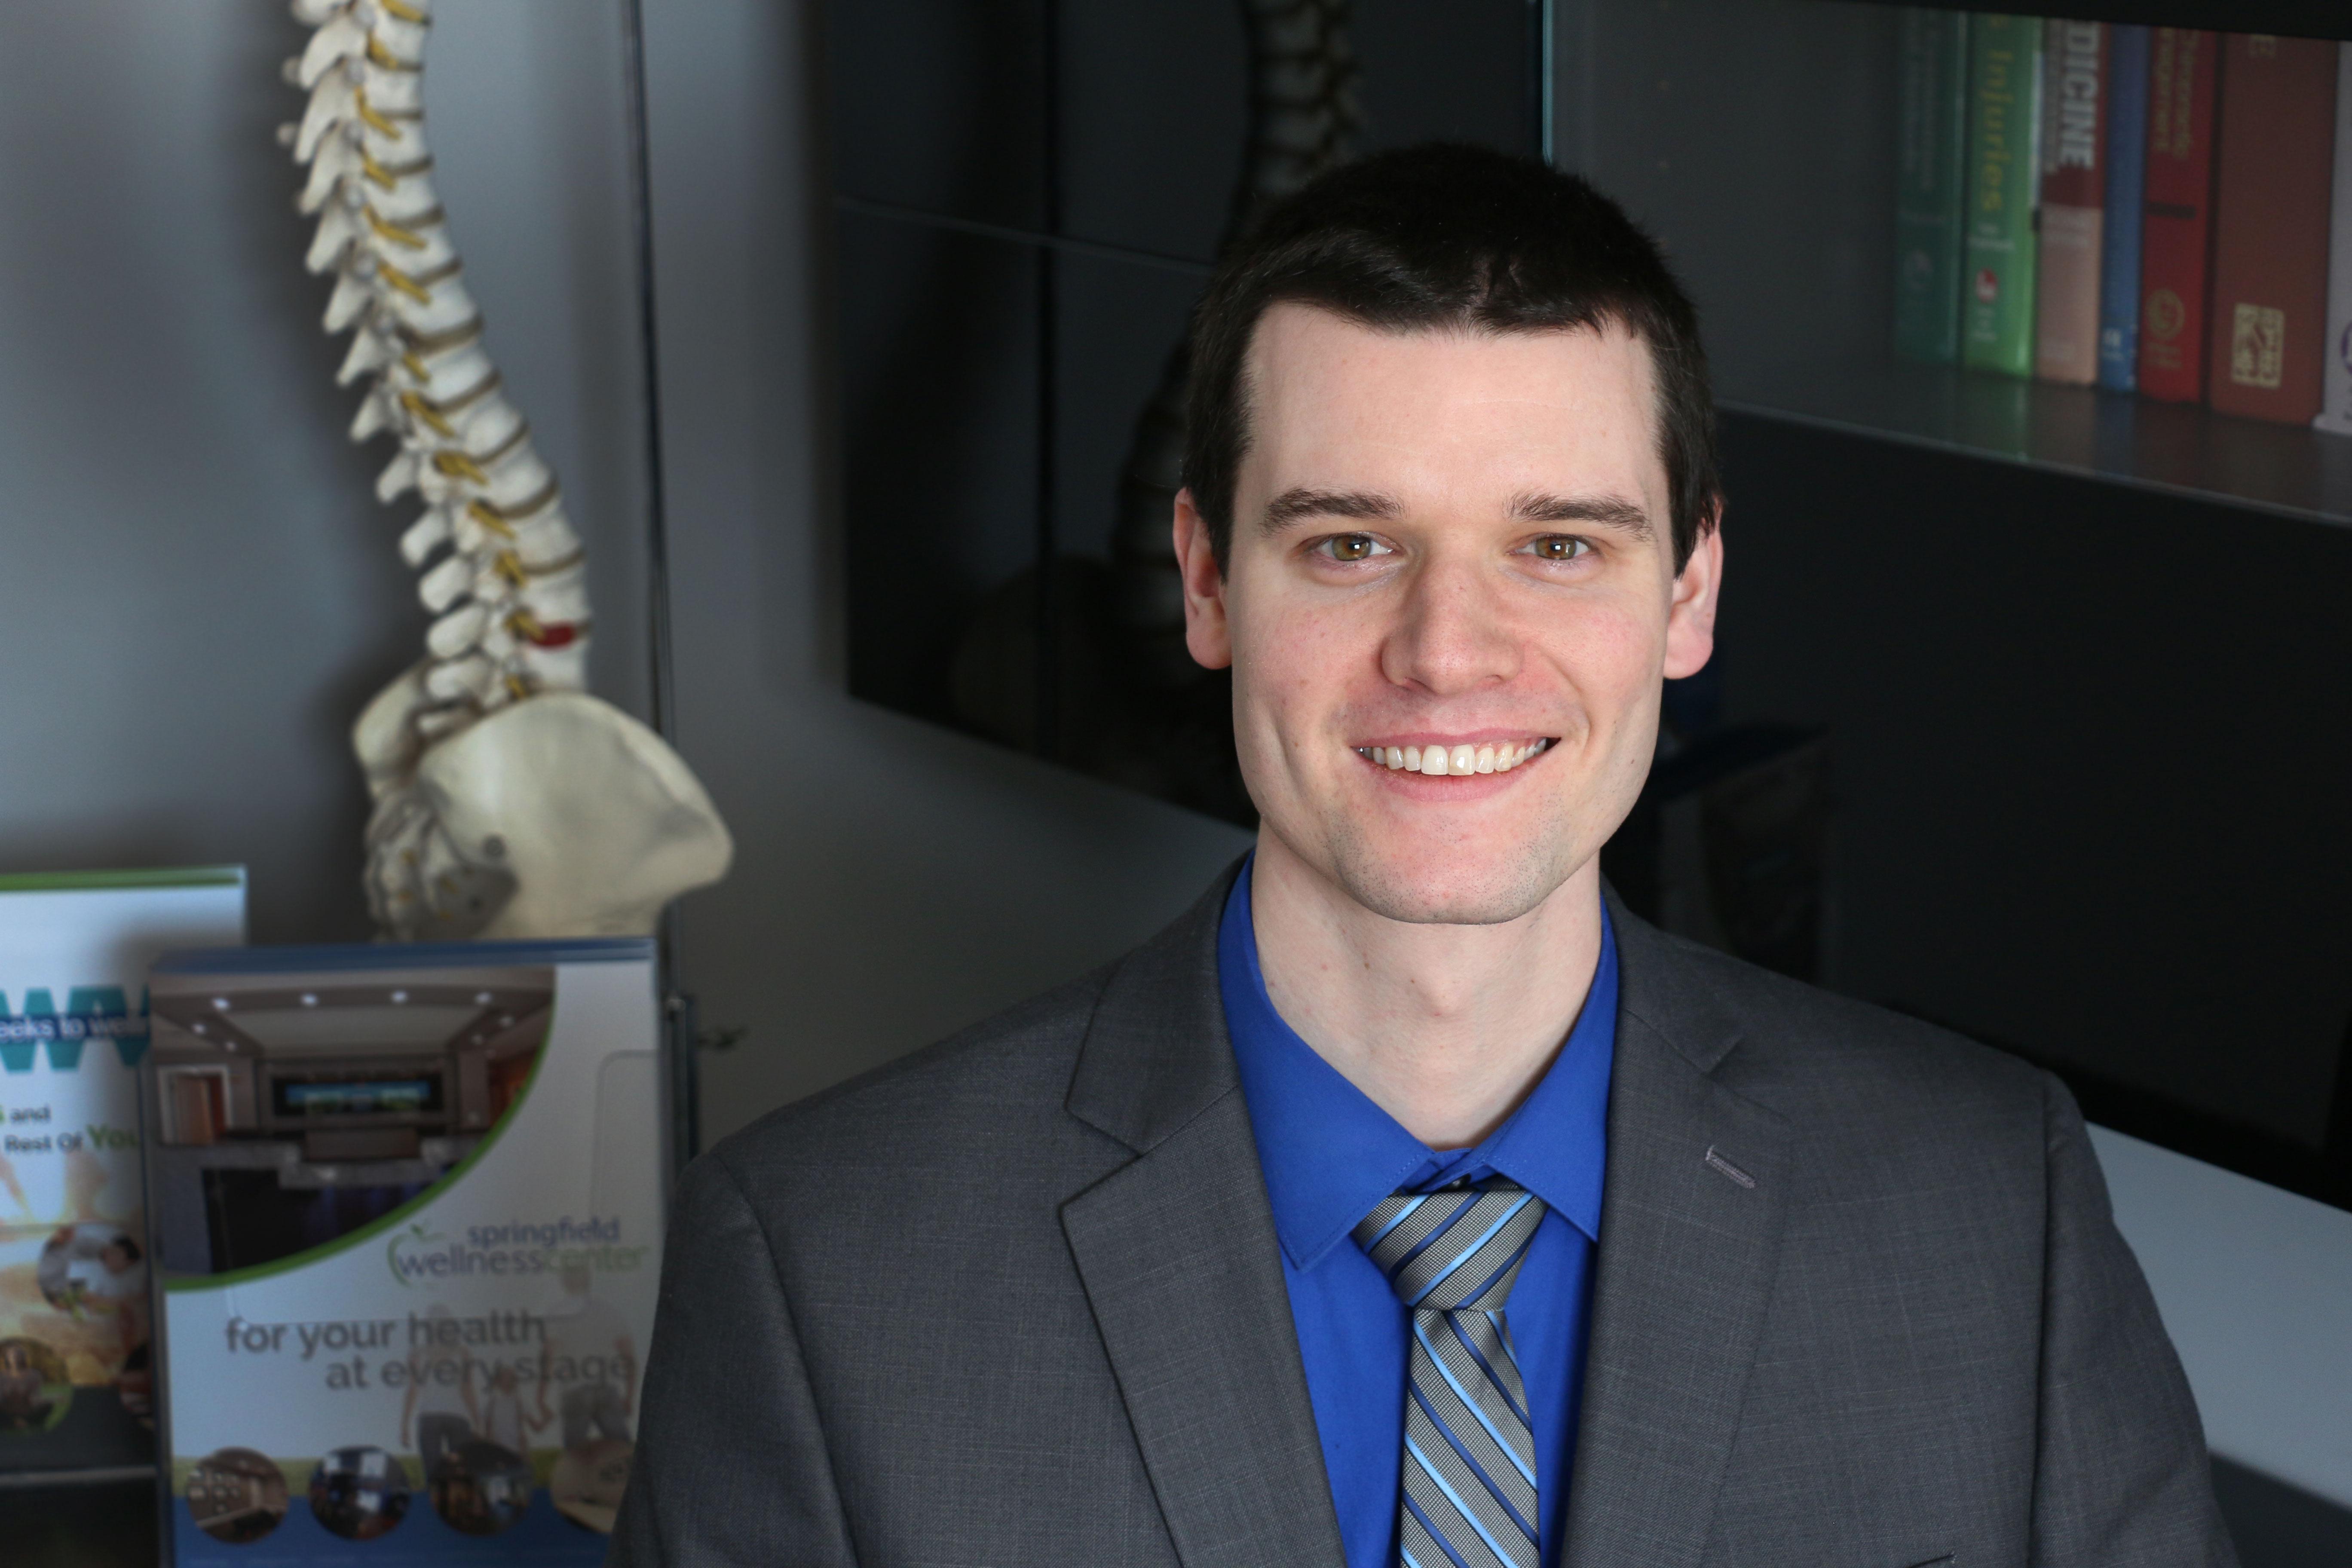 Chiropractor Springfield, Dr. Pat Macquley